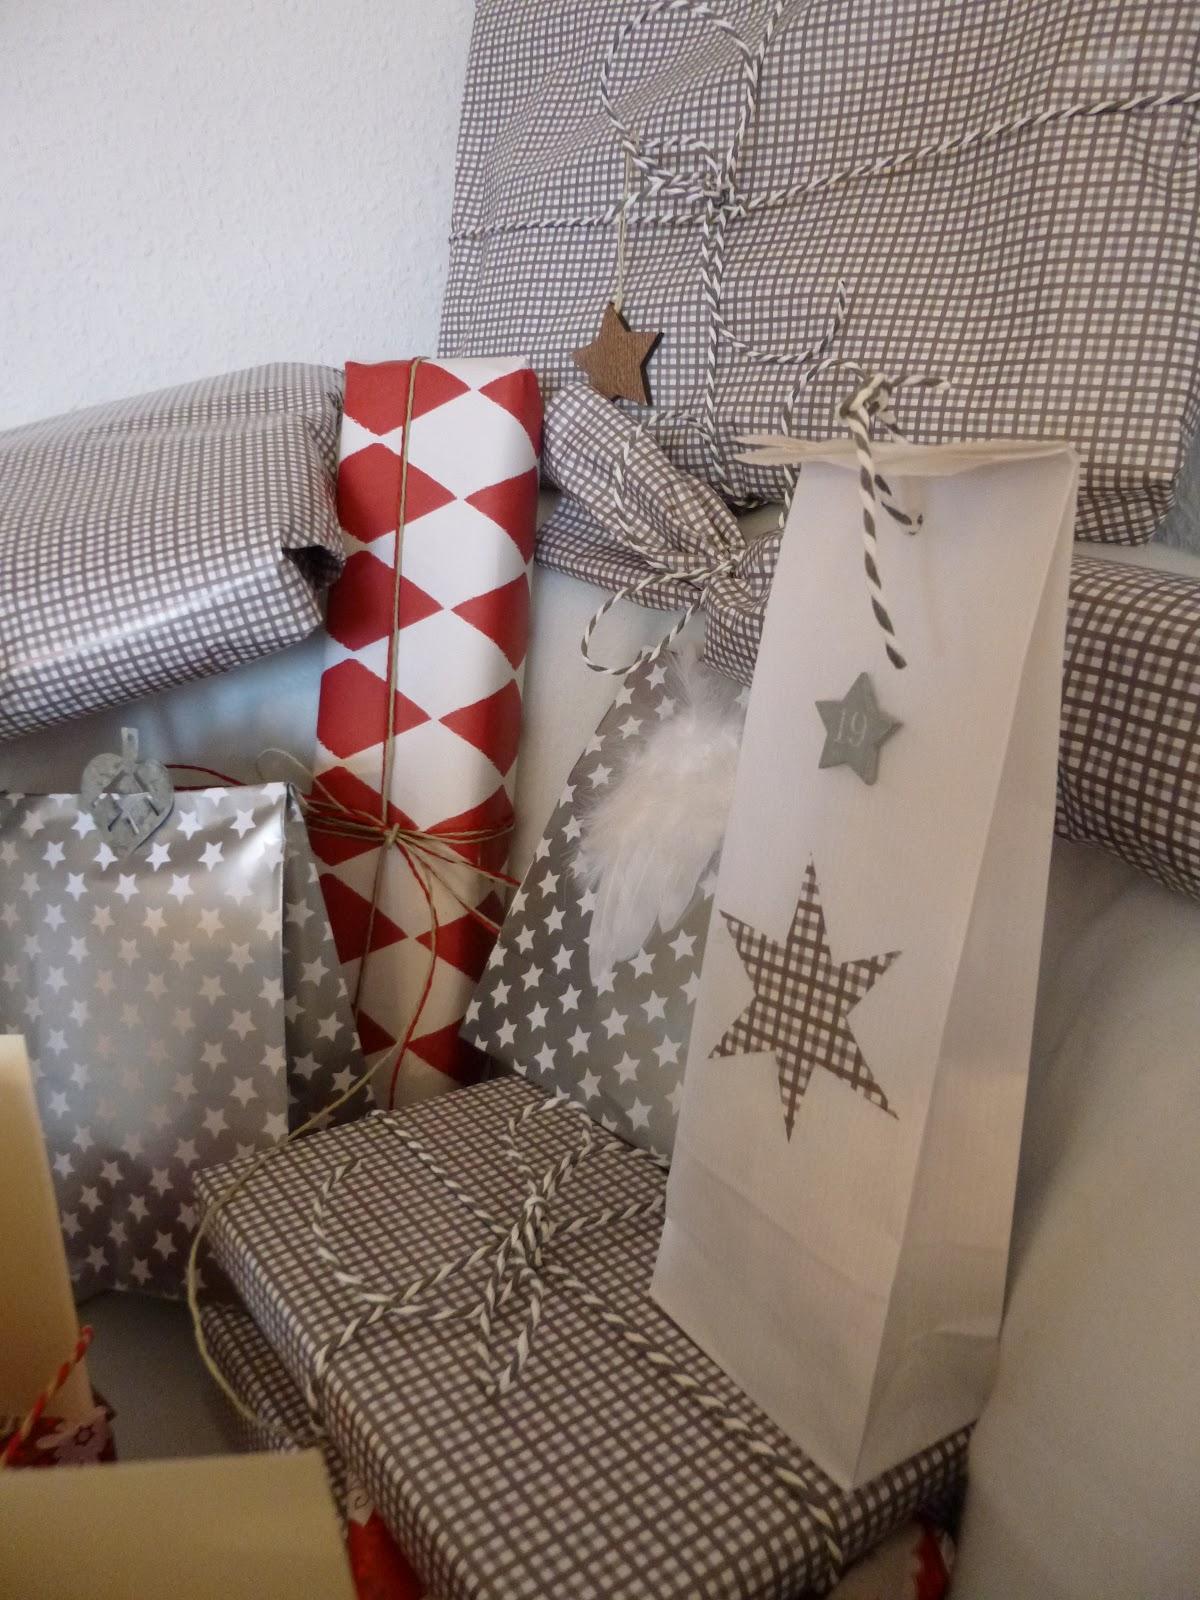 heidekind geschenke. Black Bedroom Furniture Sets. Home Design Ideas